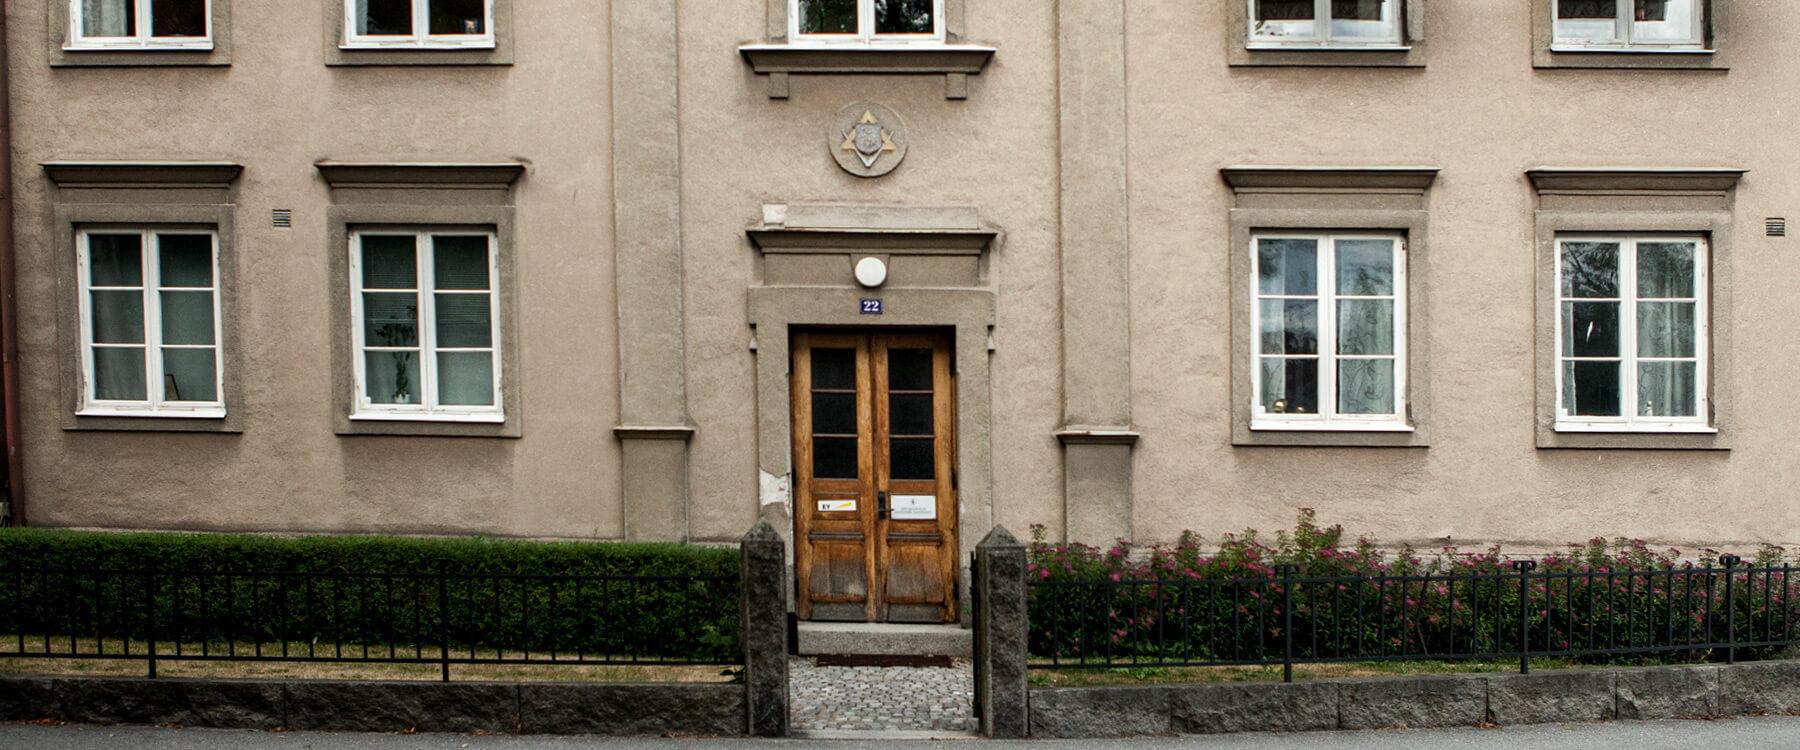 advokat-fritzdorf-jacobsson-karlshamn-entre-mottagning